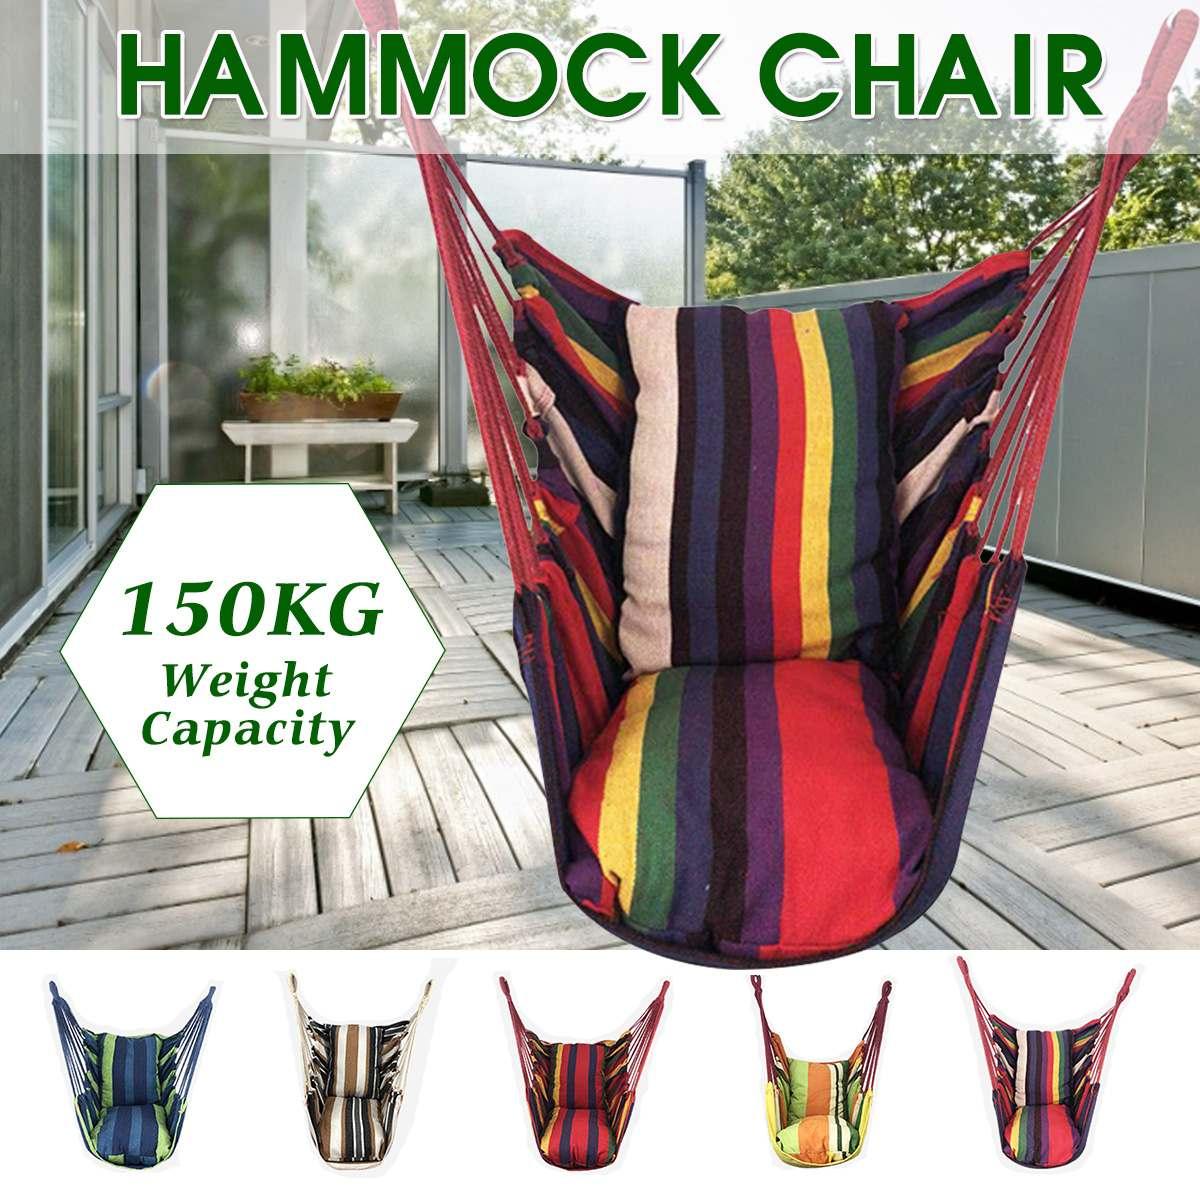 Hammock Chair Swing Chair Seat Travel Camping Hammock Outdoor Garden Adults Kids Hanging Chair furniture neck hammock(China)